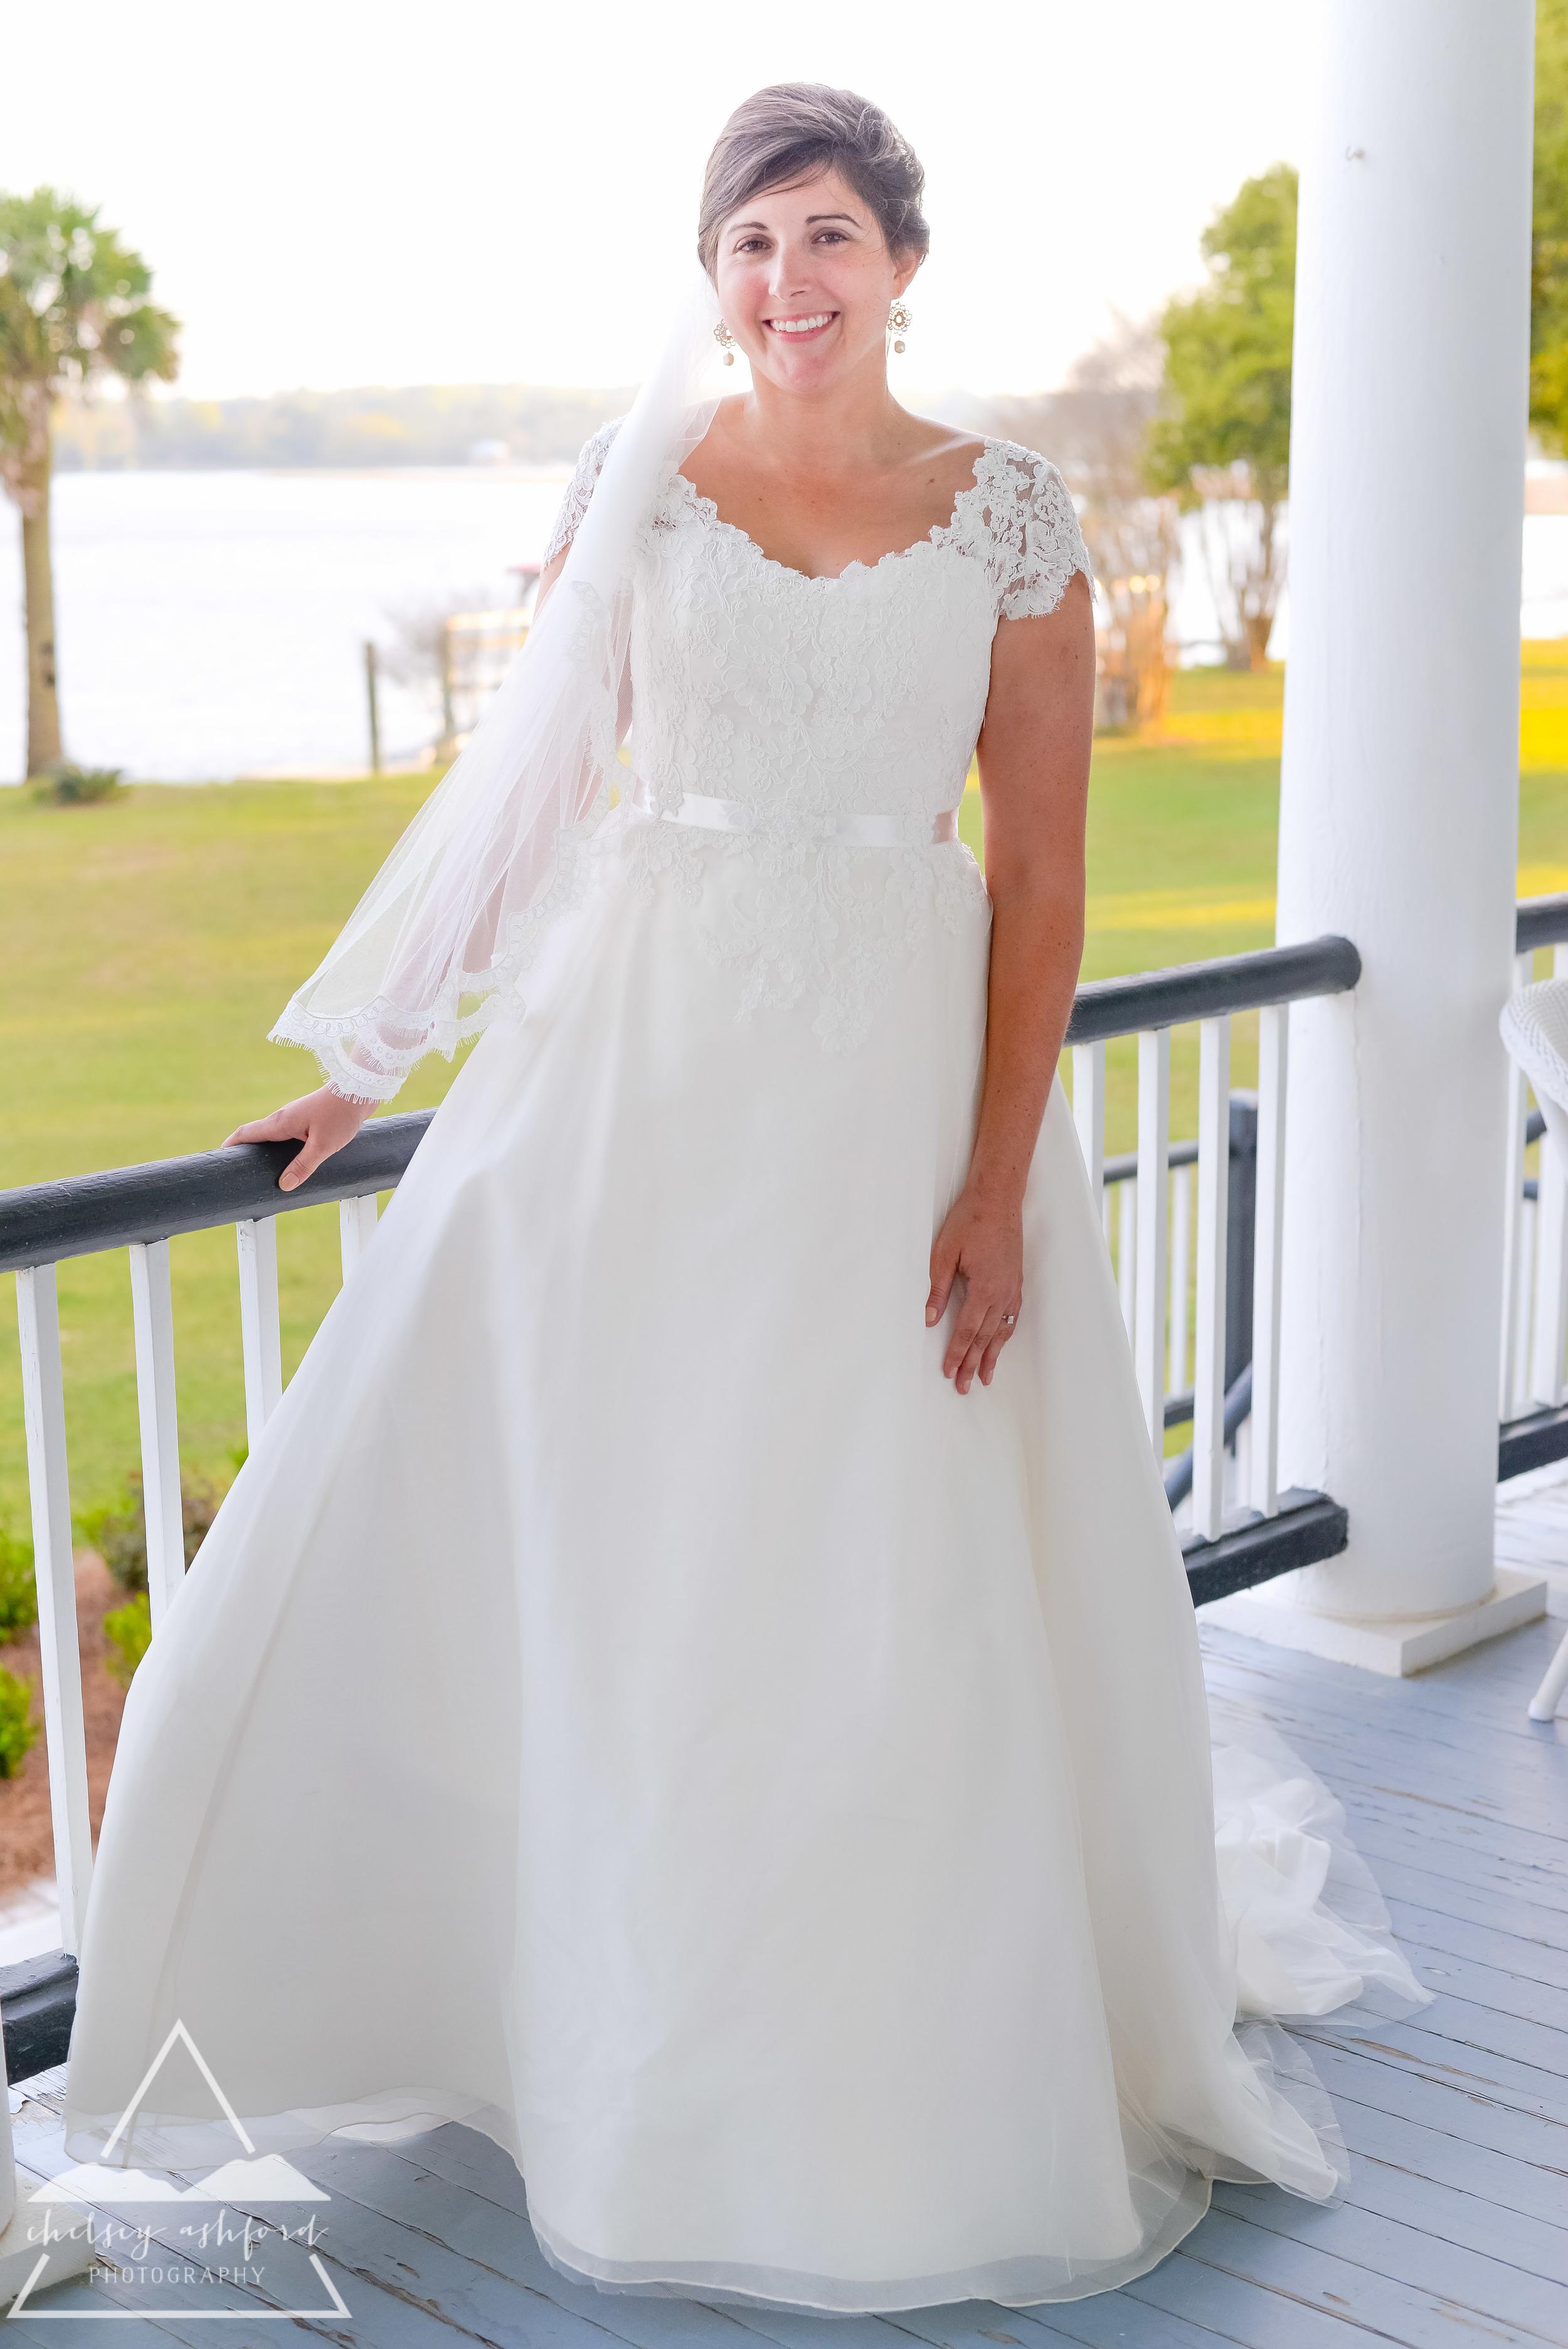 Sylvia_bridals_web-50.jpg